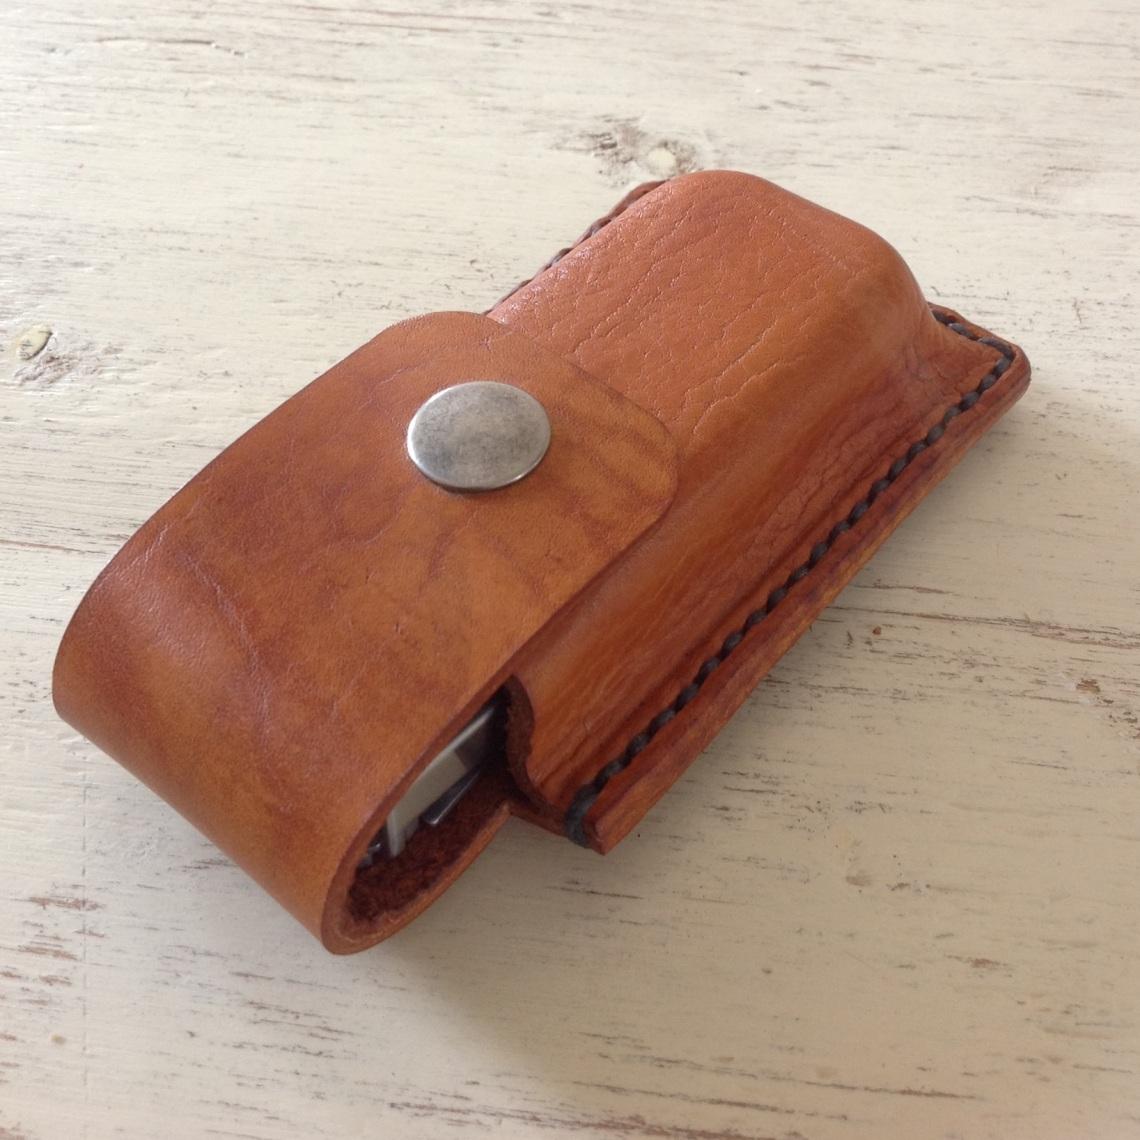 Leather Leatherman case side